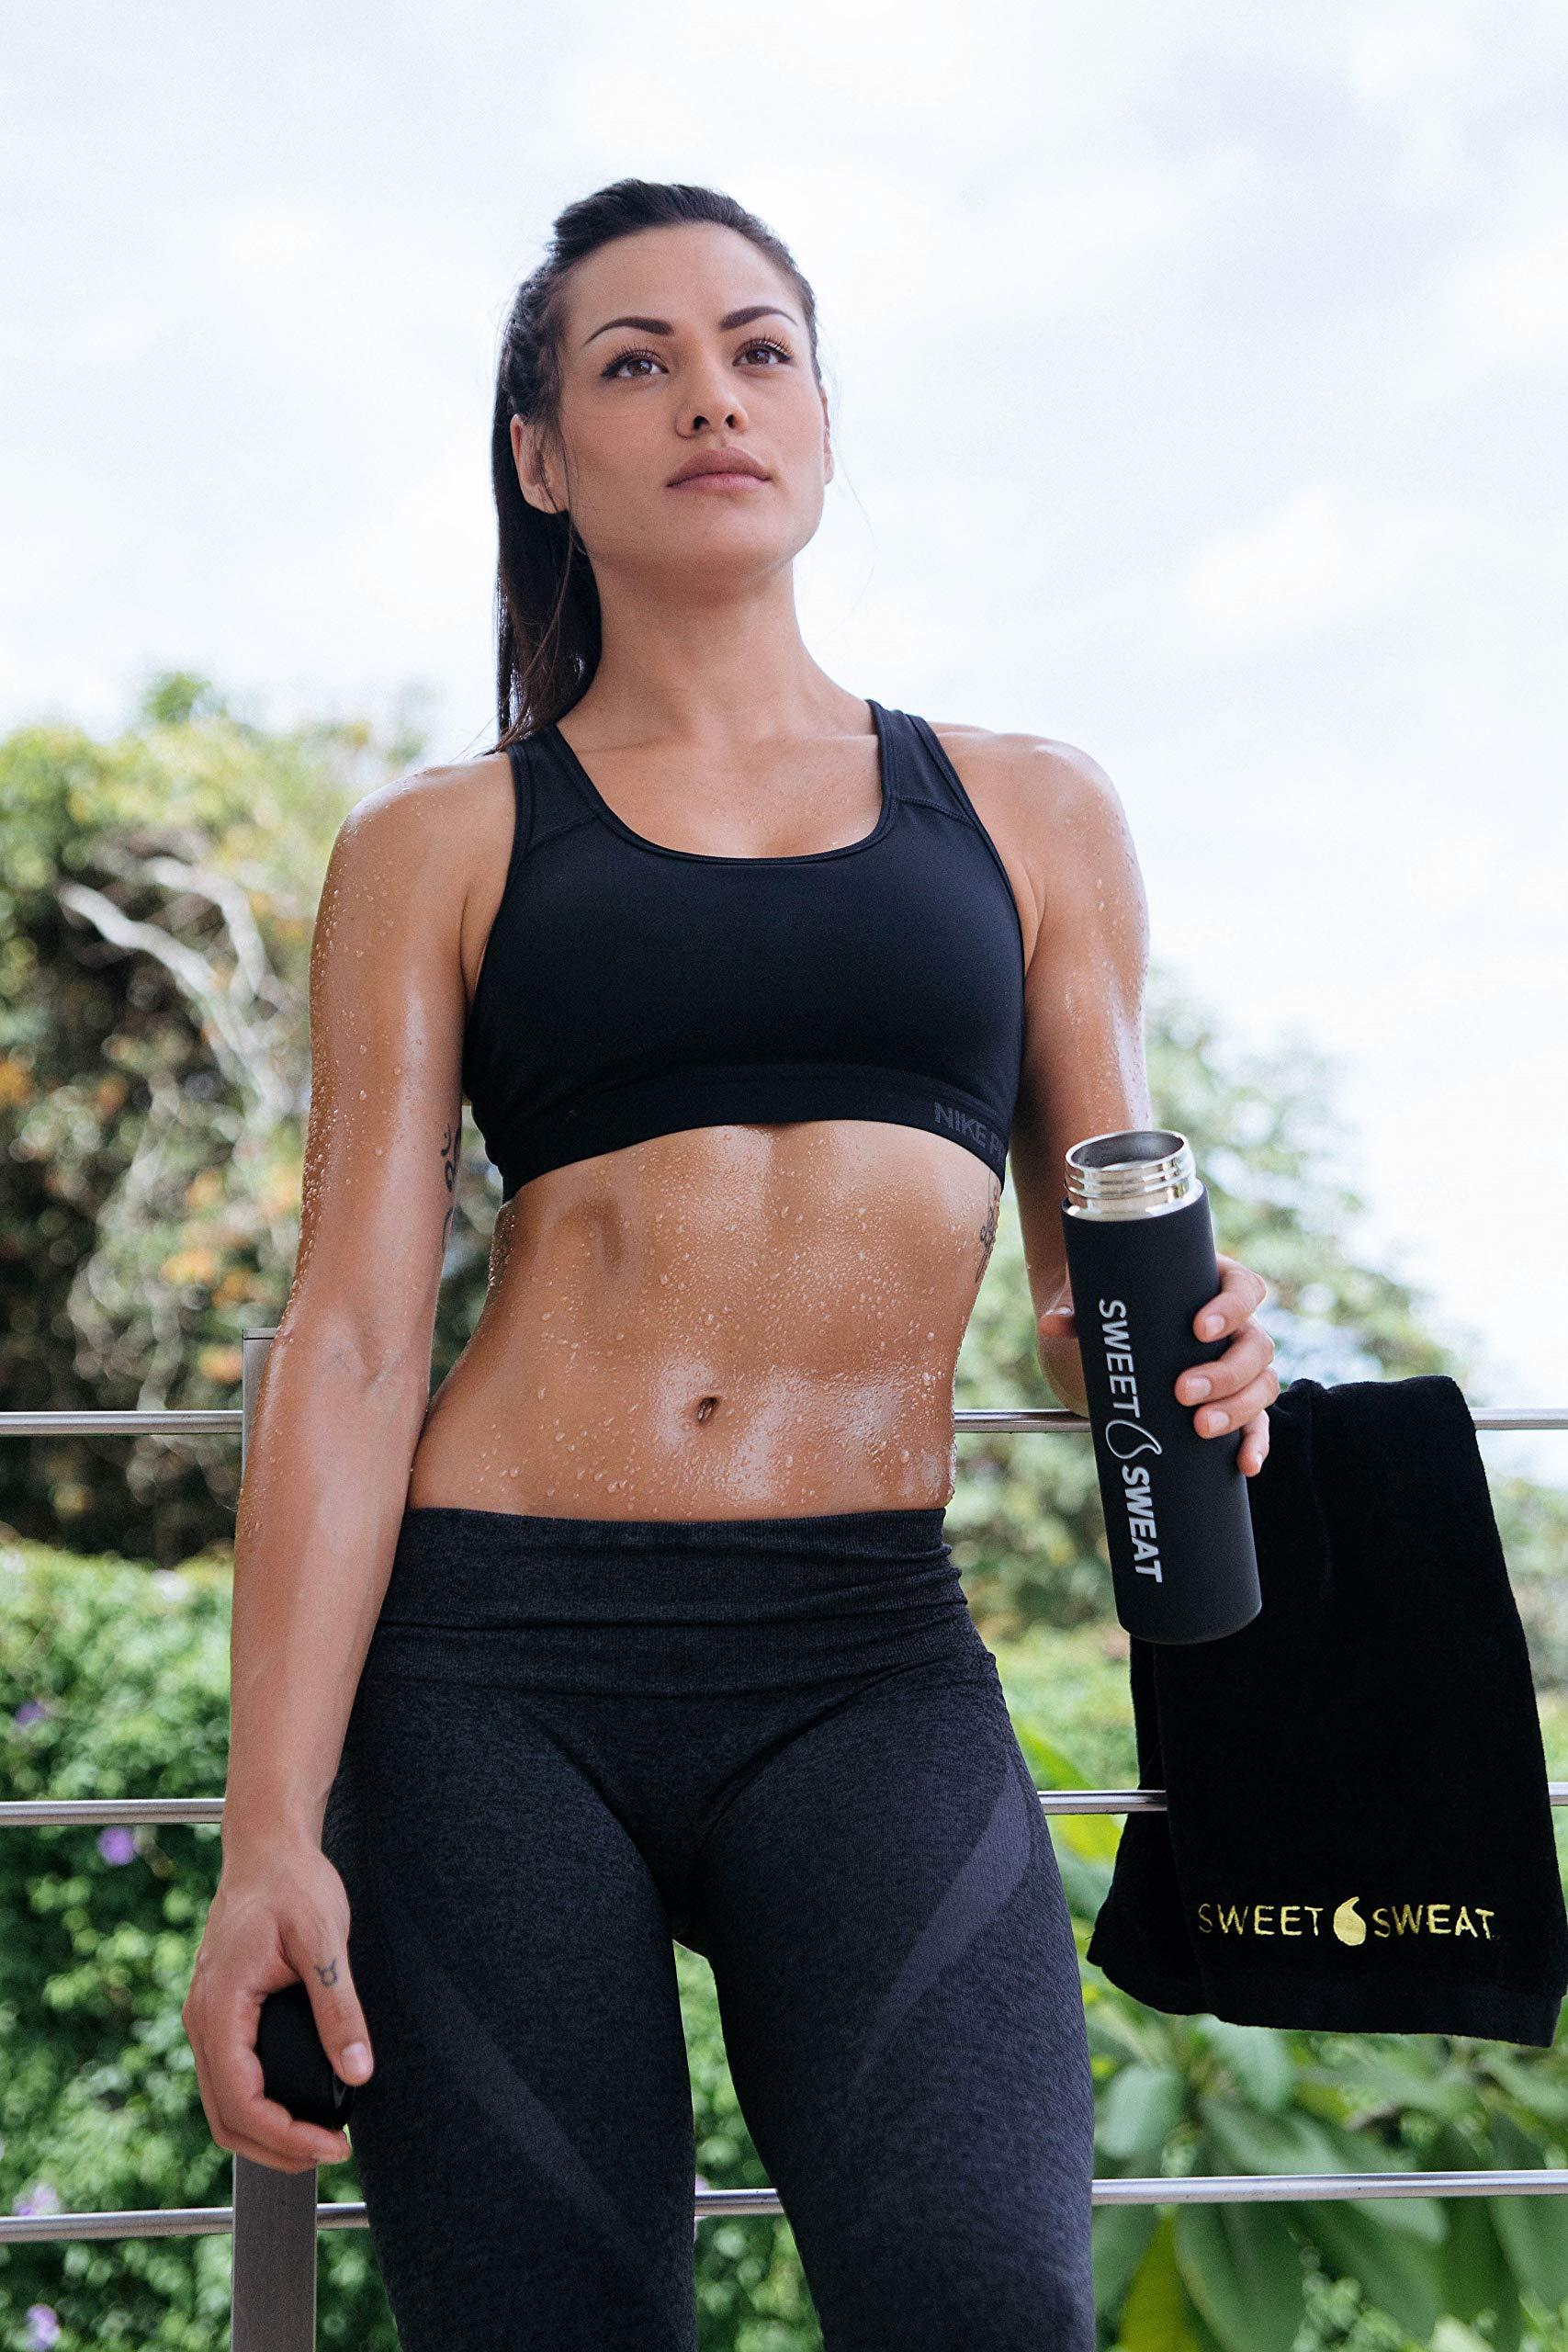 Sweet Sweat 'Workout Enhancer' Gel - 6.4oz Sports Stick by Sports Research